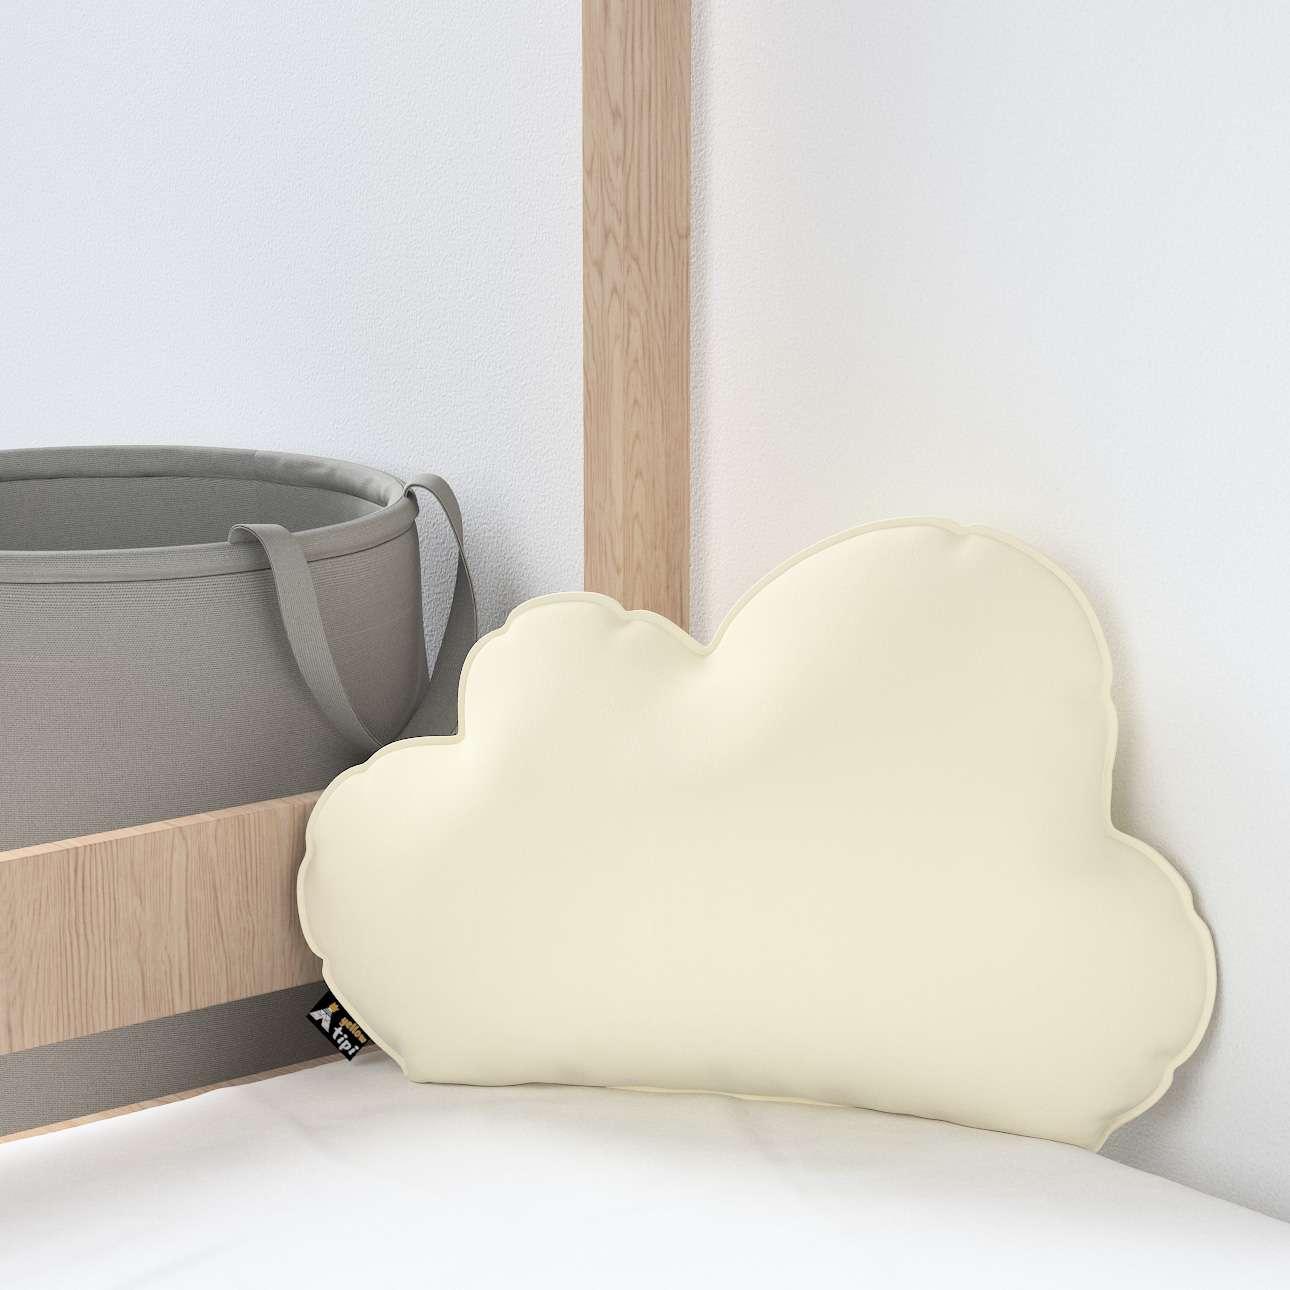 Soft Cloud pagalvėlė kolekcijoje Posh Velvet, audinys: 704-10